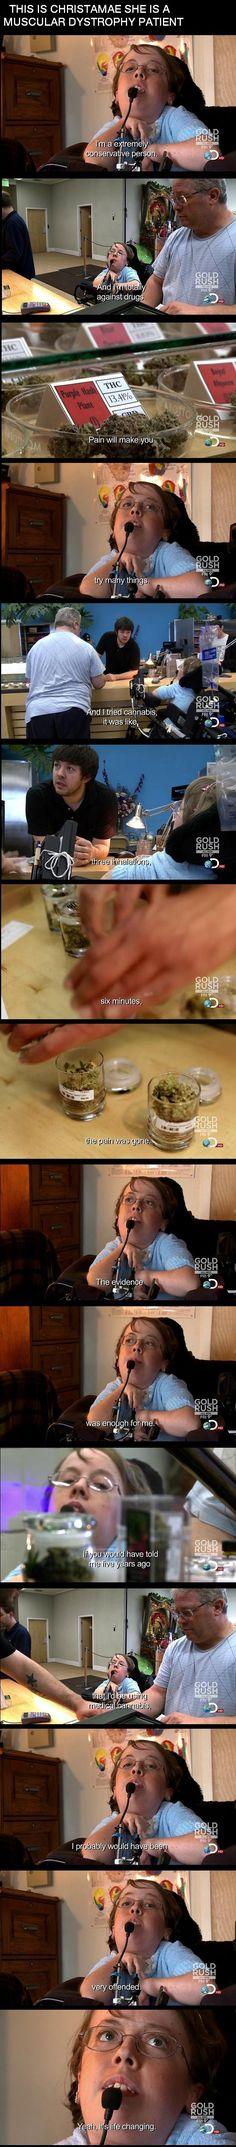 This is very motivational. Medical Cannabis. www.SativaMagazine.com #SativaMagazine ( marijuana cannabis )